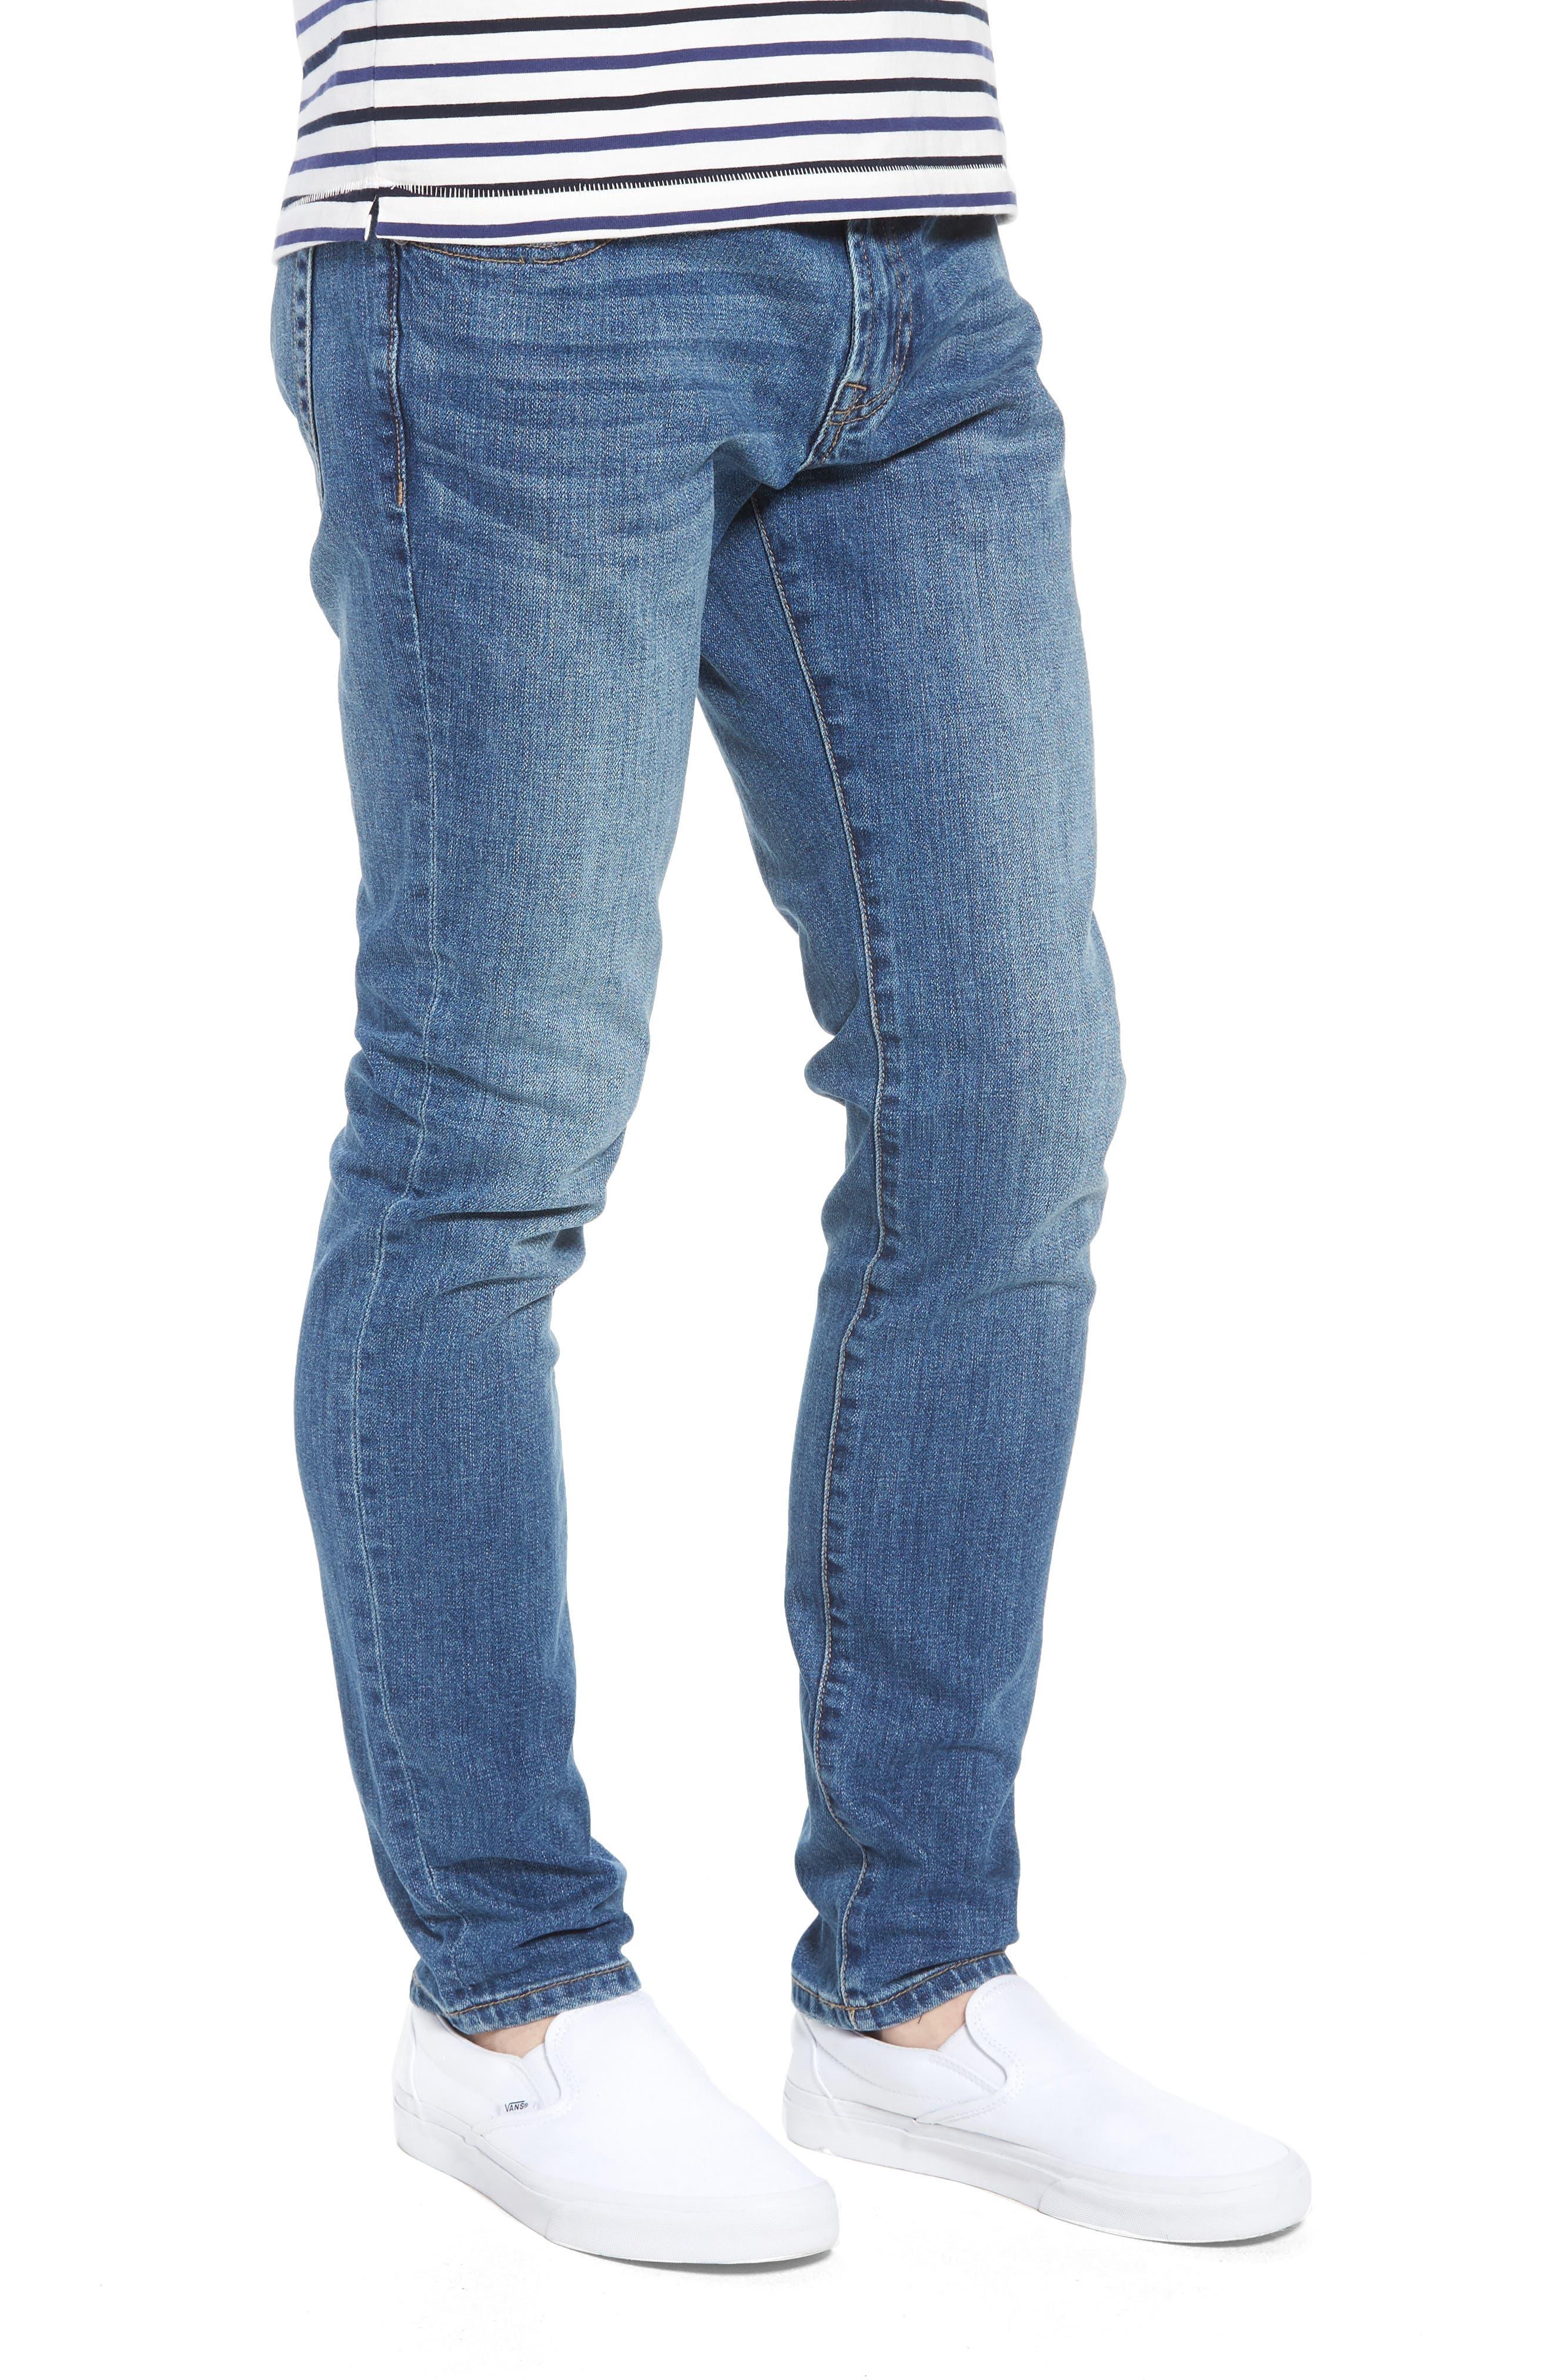 Jeans Co. Bond Skinny Fit Jeans,                             Alternate thumbnail 3, color,                             Bryson Vintage Medium